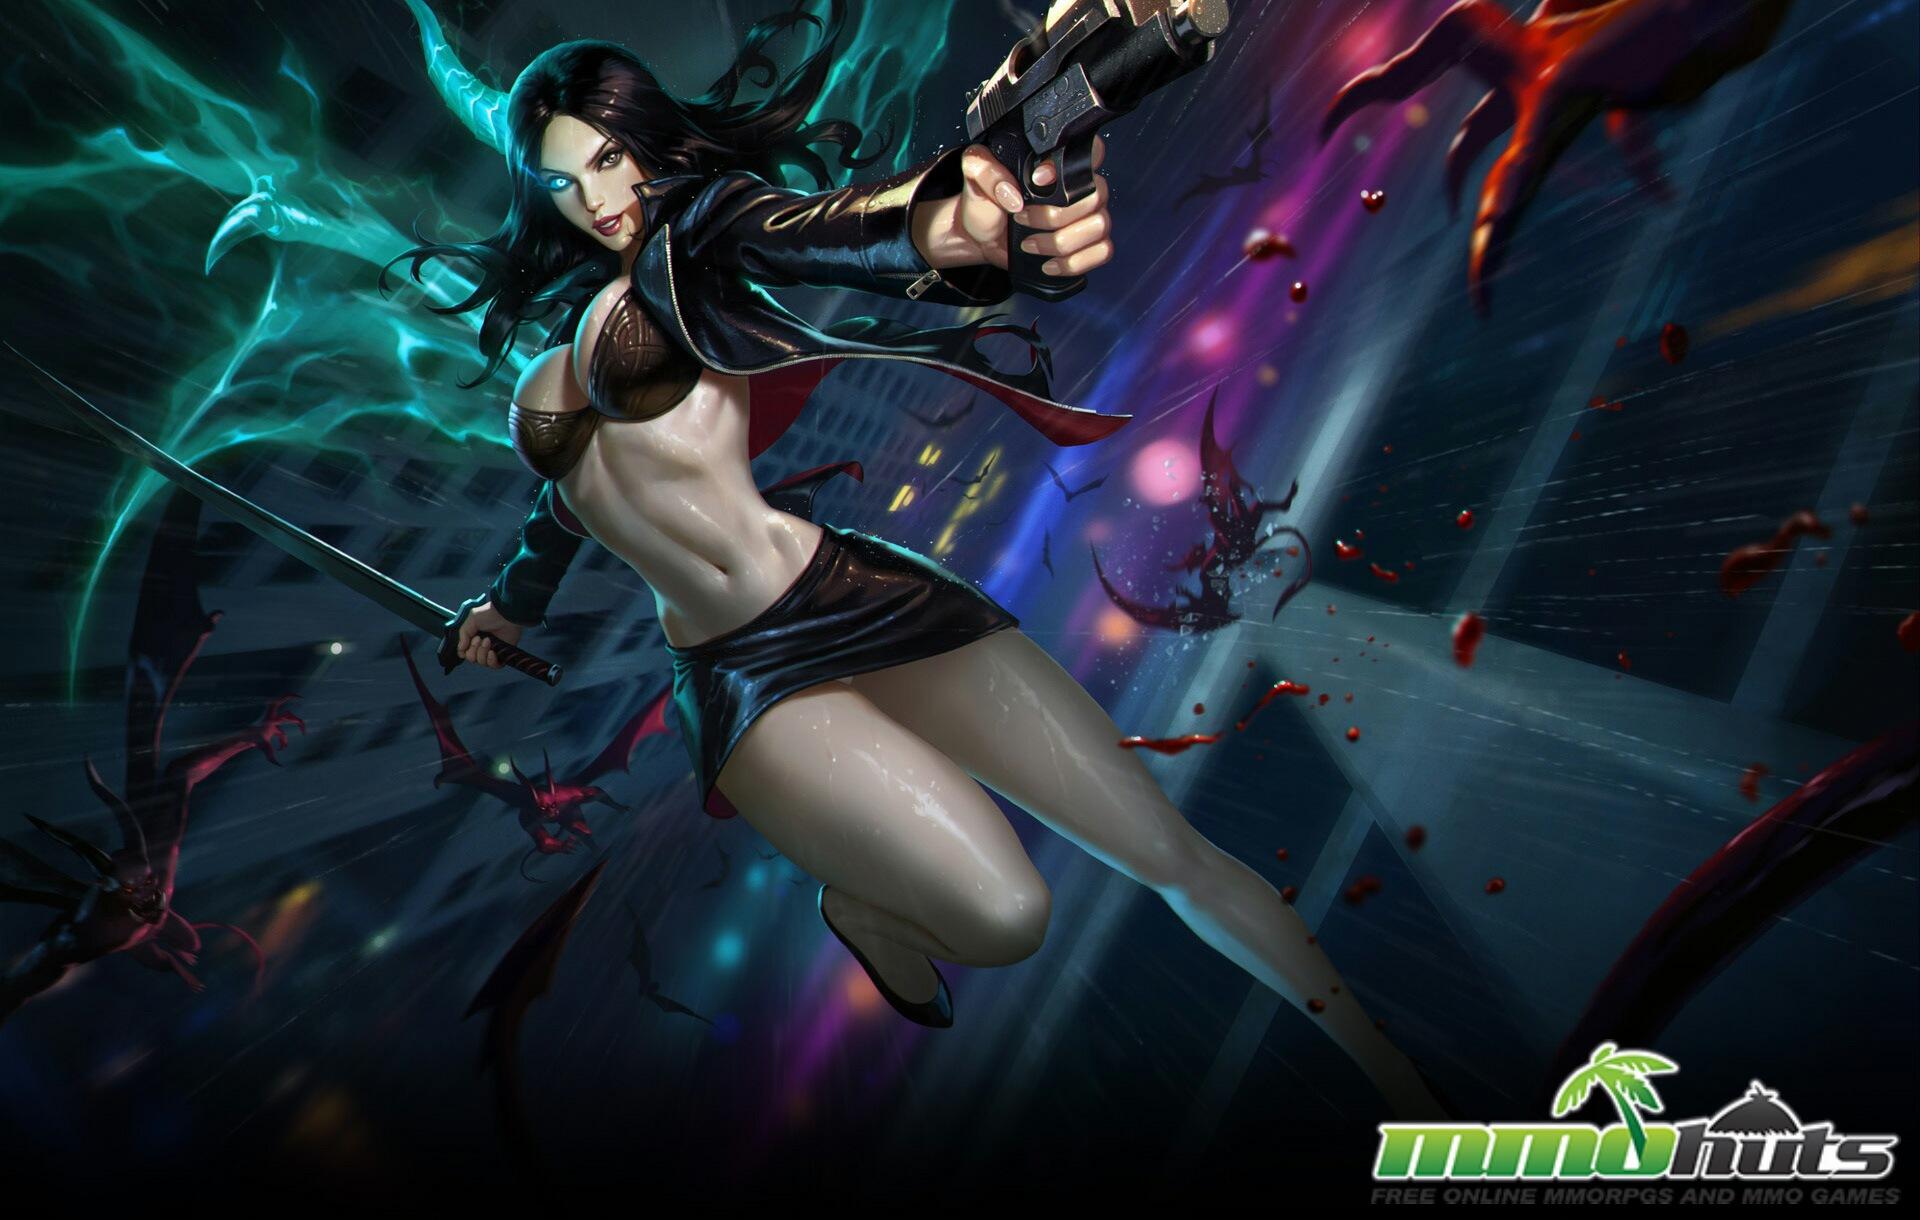 Full Gameplay Image Gallery